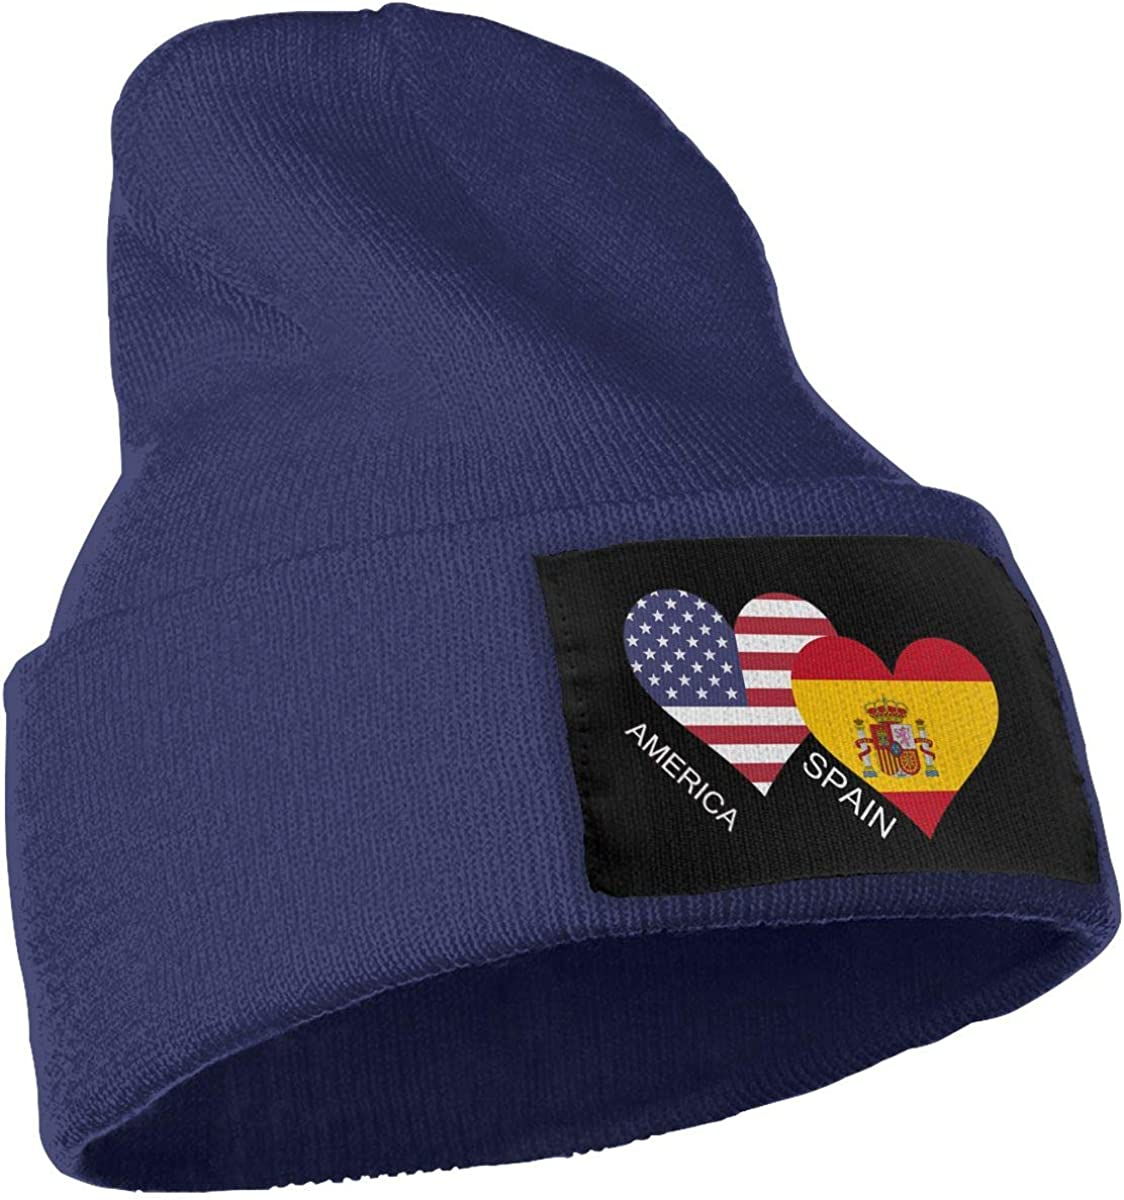 COLLJL-8 Men//Women America Spain Flag Heart Outdoor Stretch Knit Beanies Hat Soft Winter Knit Caps